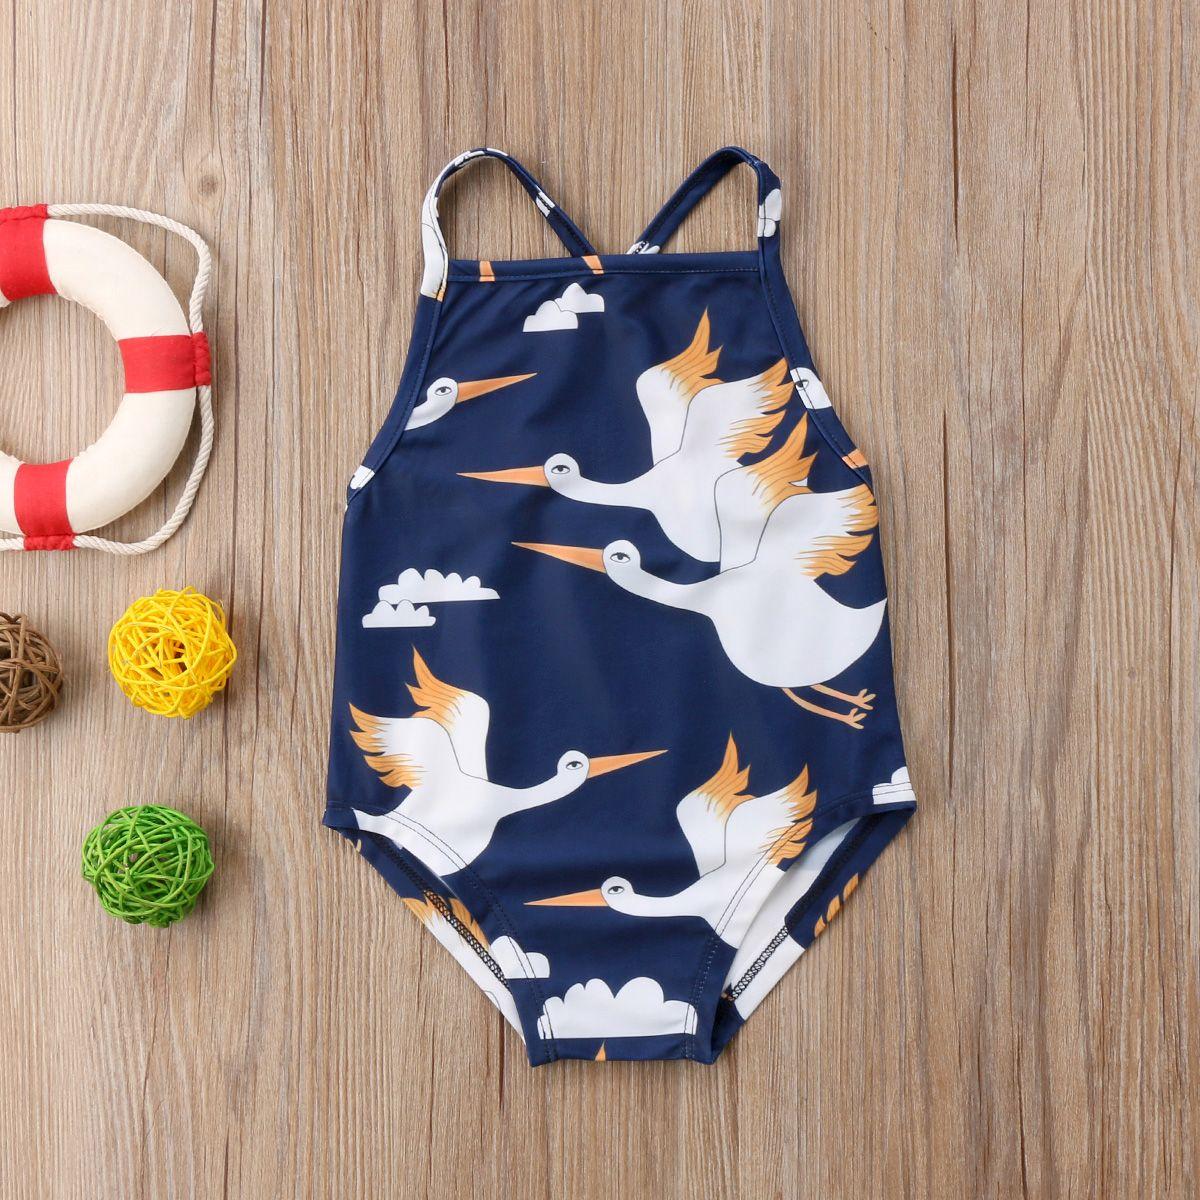 New Baby Girls Animal Swimwear Kids One-piece Bowknot Summer ...